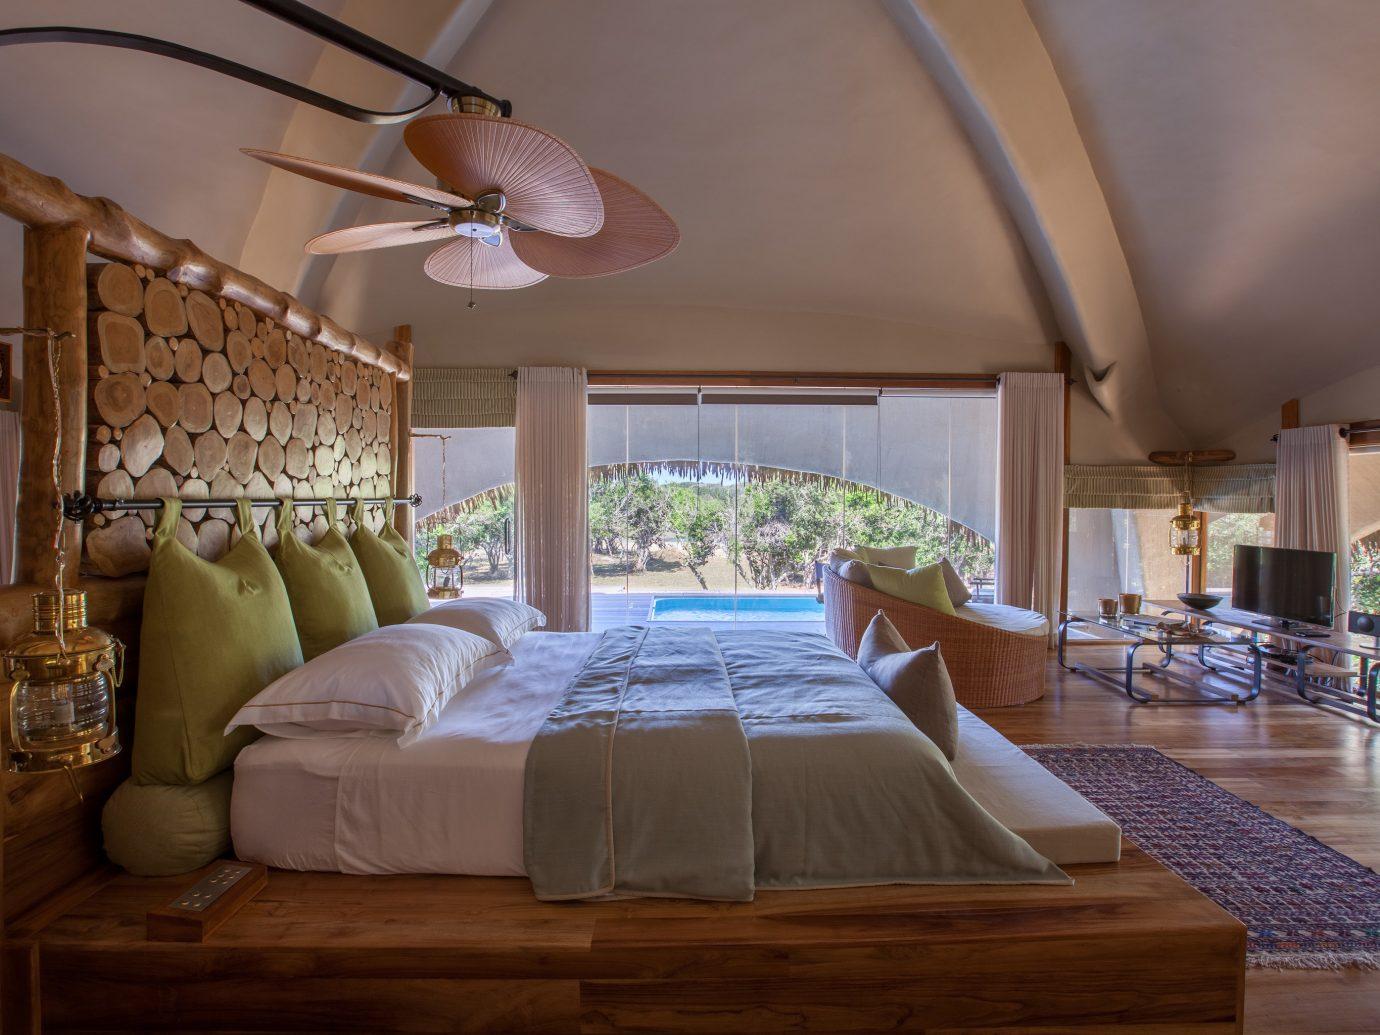 All-Inclusive Resorts Beach Hotels indoor wall bed floor room ceiling interior design Bedroom estate Suite real estate hotel furniture Resort decorated